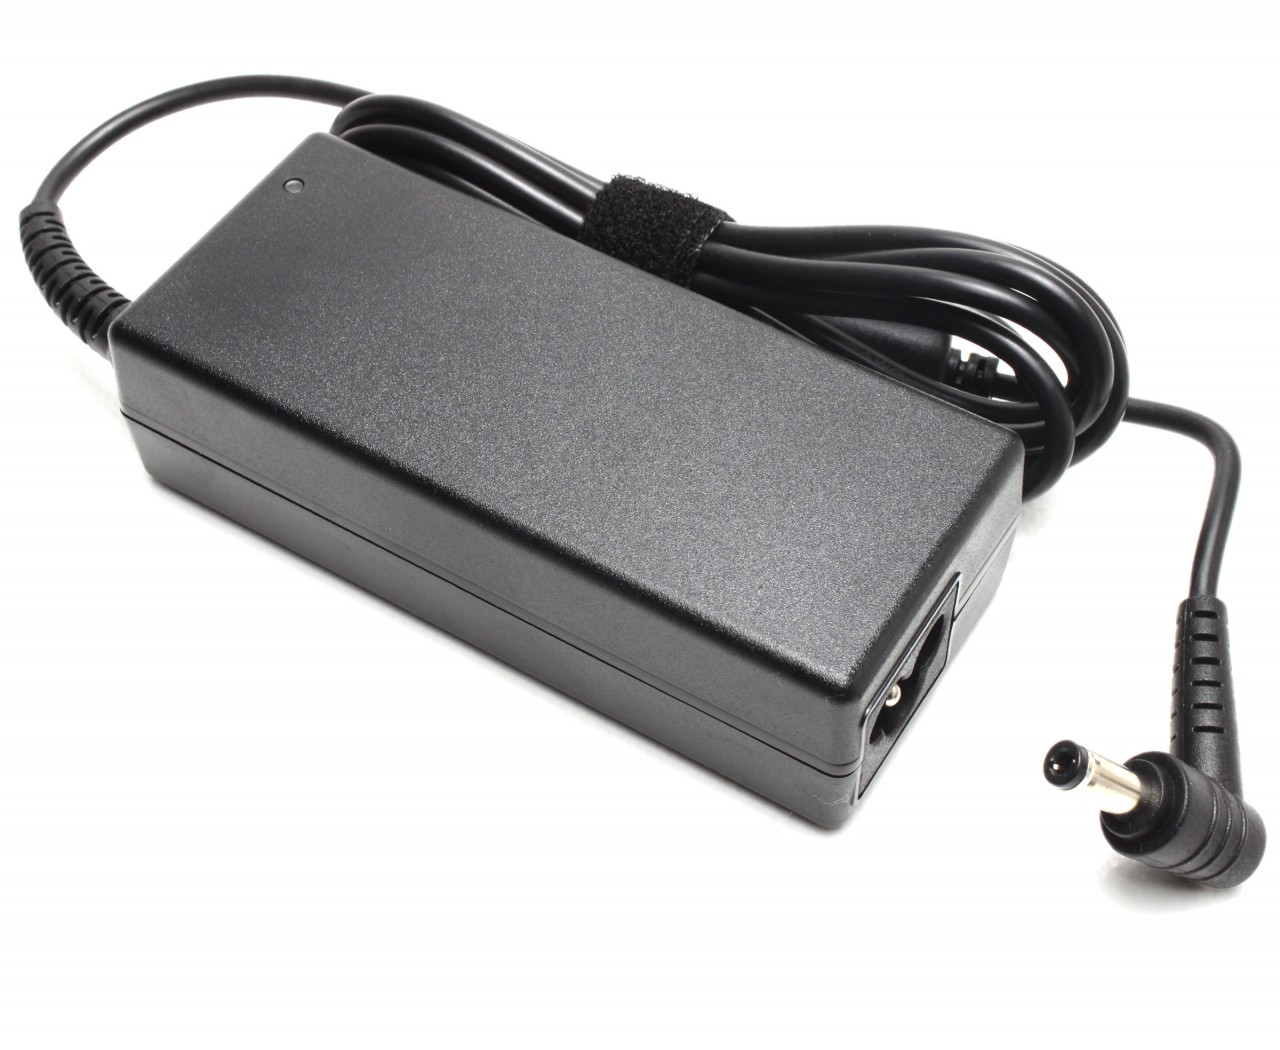 Incarcator Advent 3300B imagine powerlaptop.ro 2021